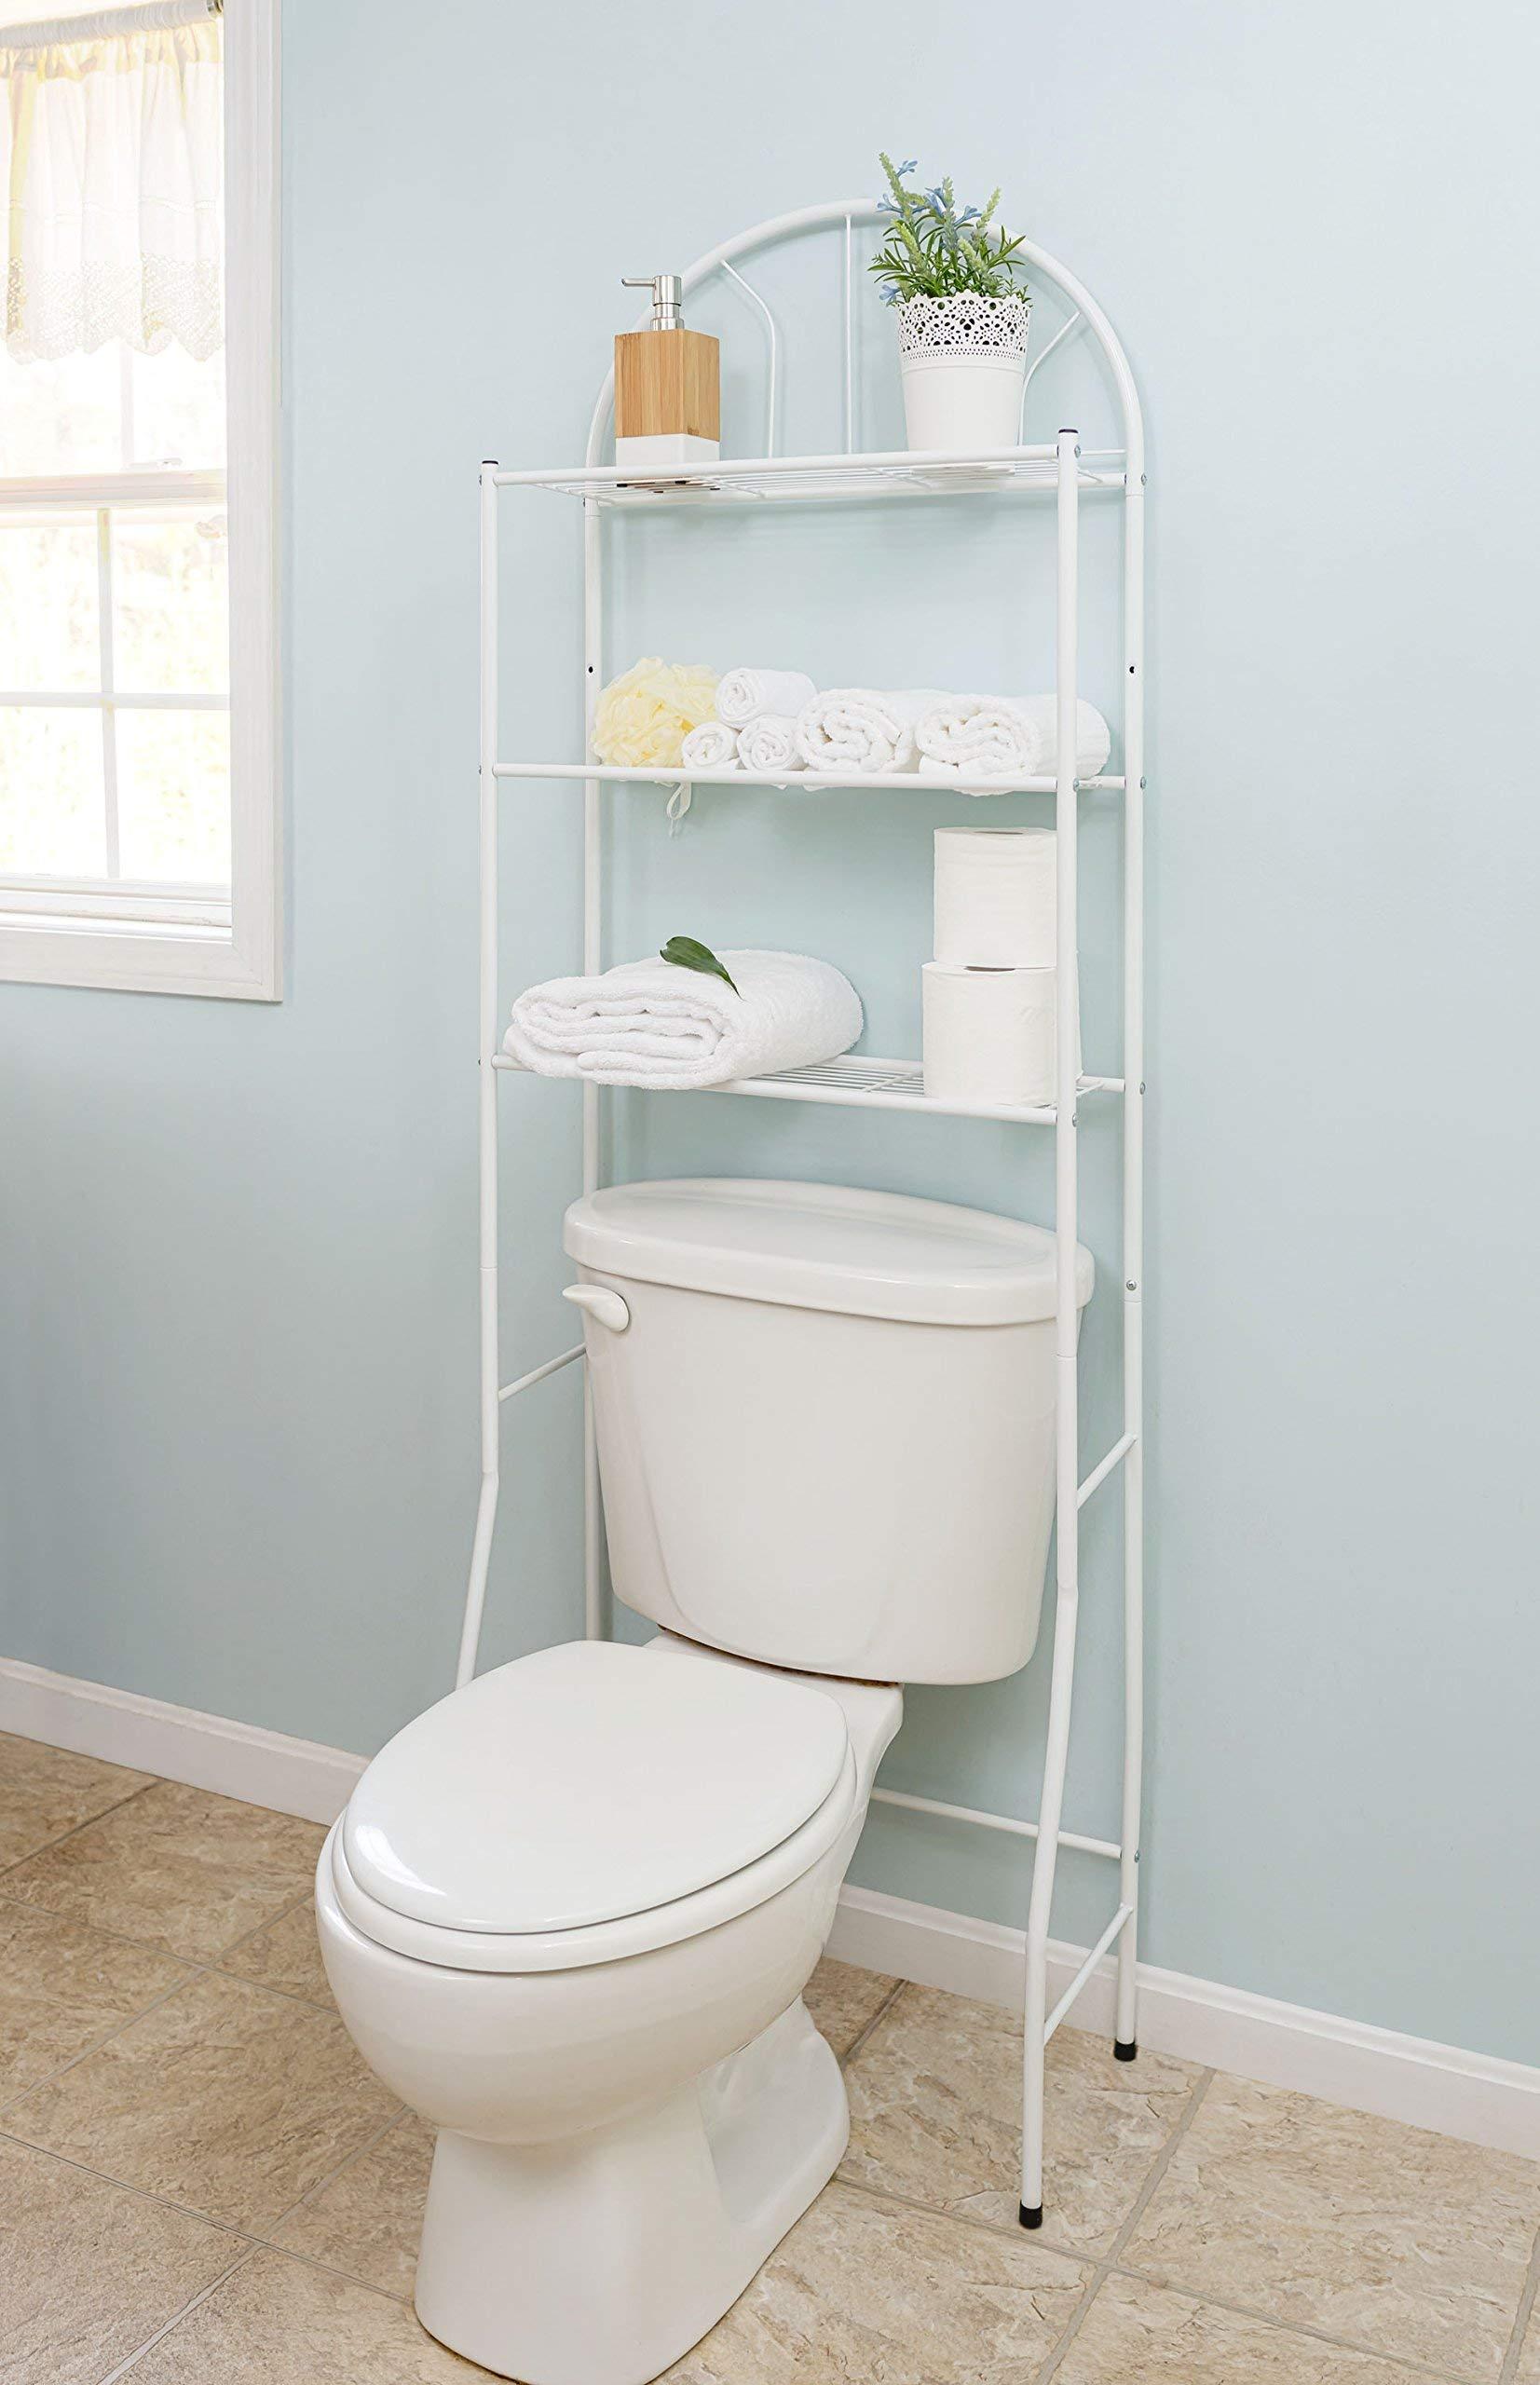 Home Basics SS10058 Bathroom Shelves Space Saver, White